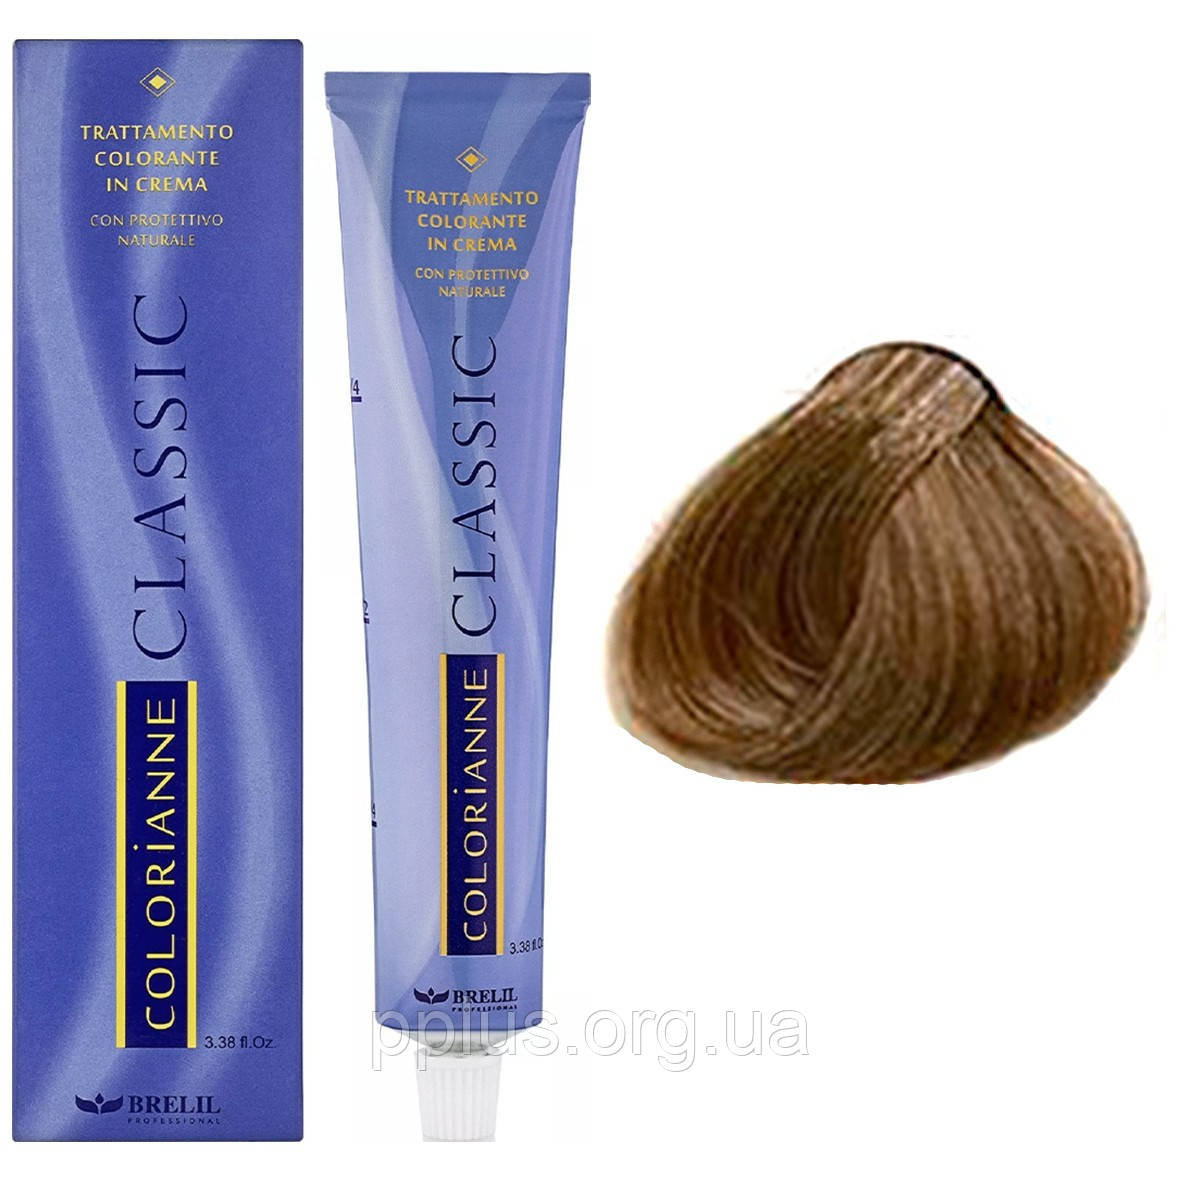 Фарба для волосся 8.03 Brelil Colorianne Classic атуральный шовковий світлий блондин 100 мл